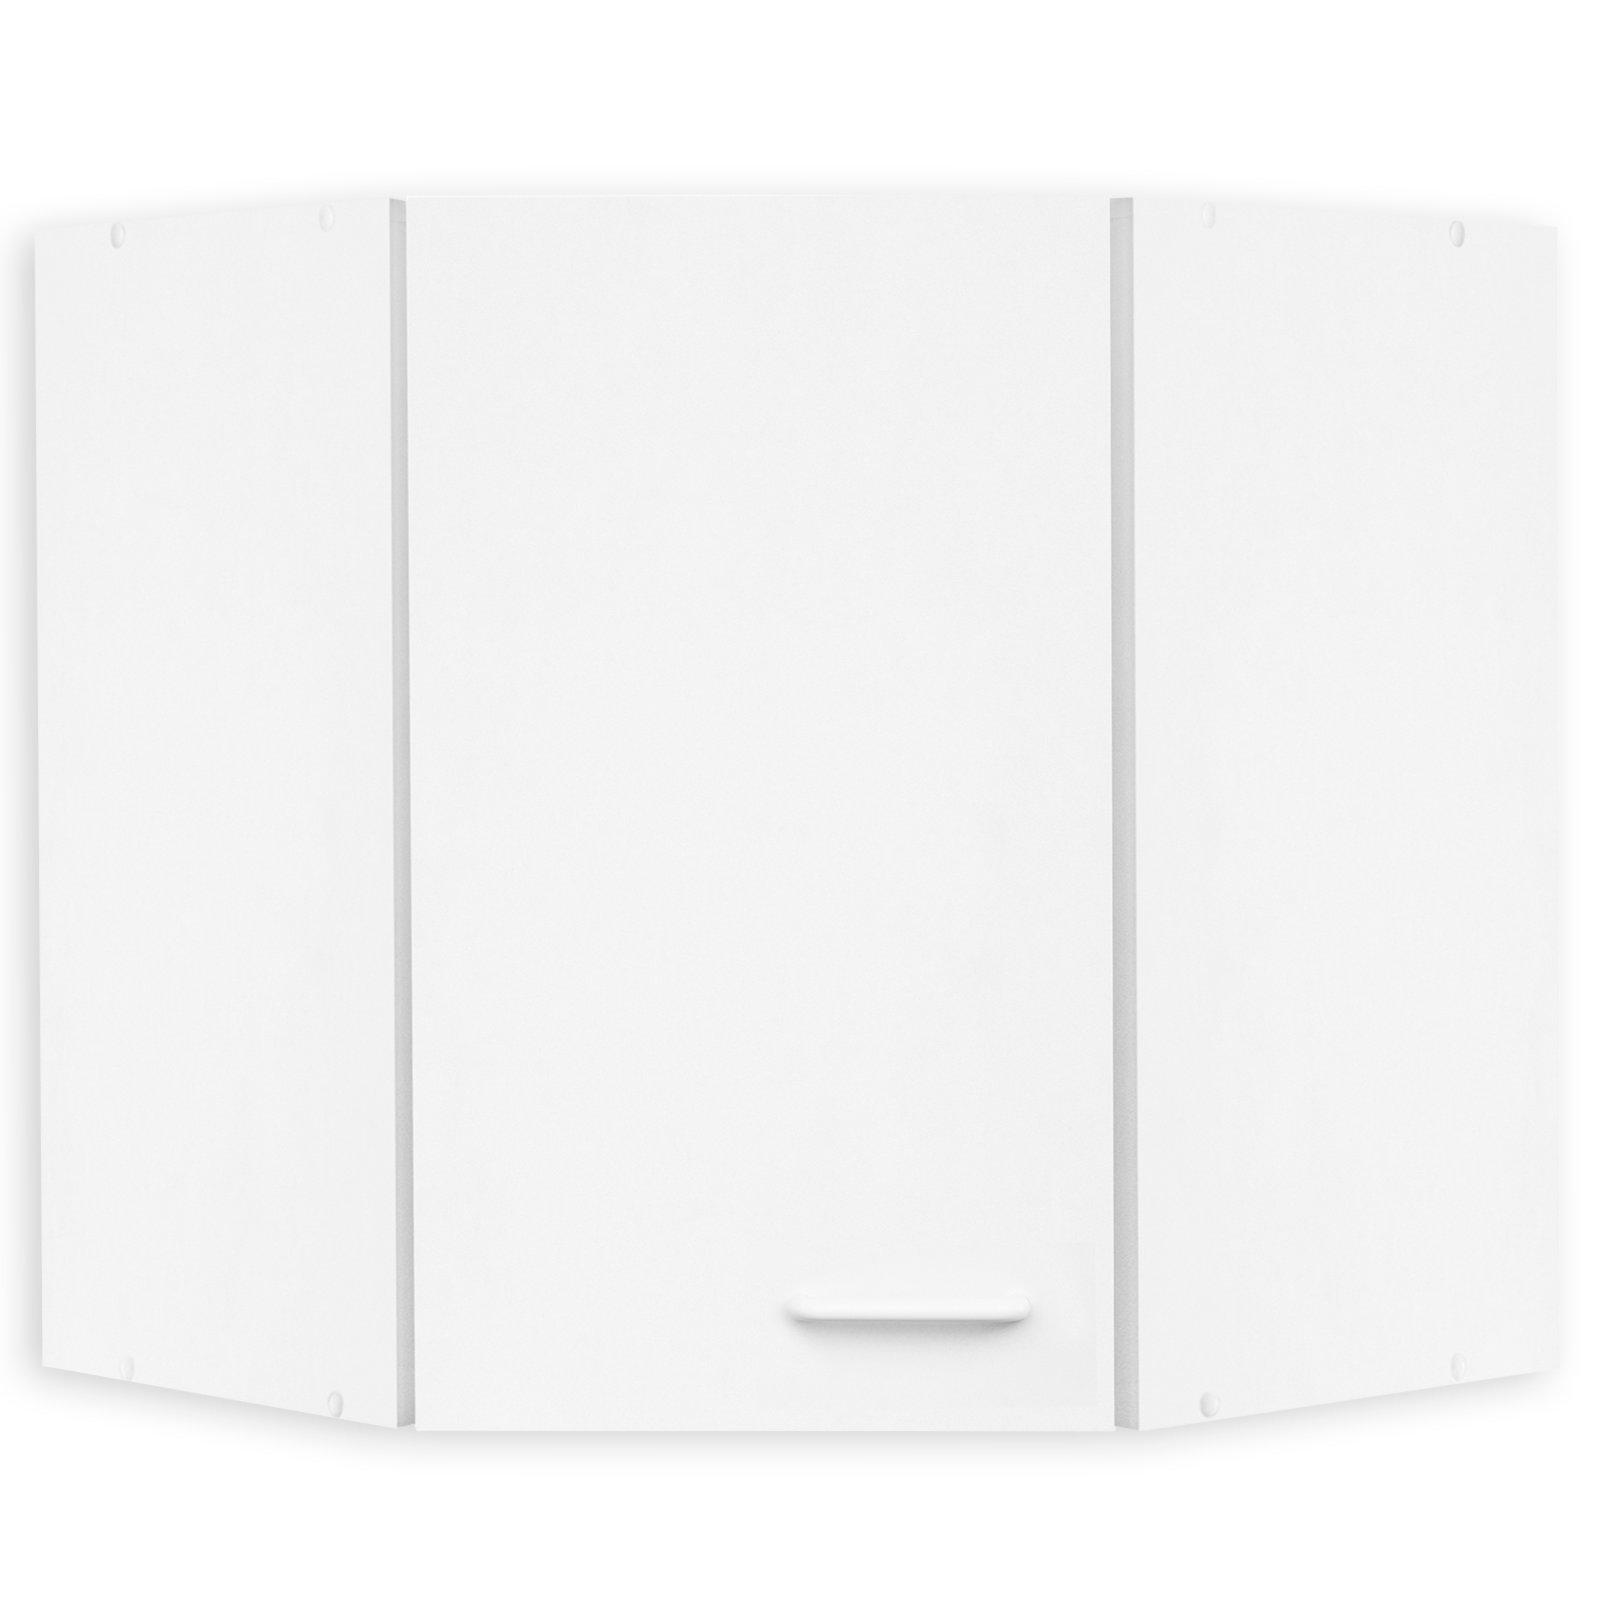 Eck-Hängeschrank WIEN - weiß - 60 cm | Eckschränke ... | {Eck hängeschrank küche 26}